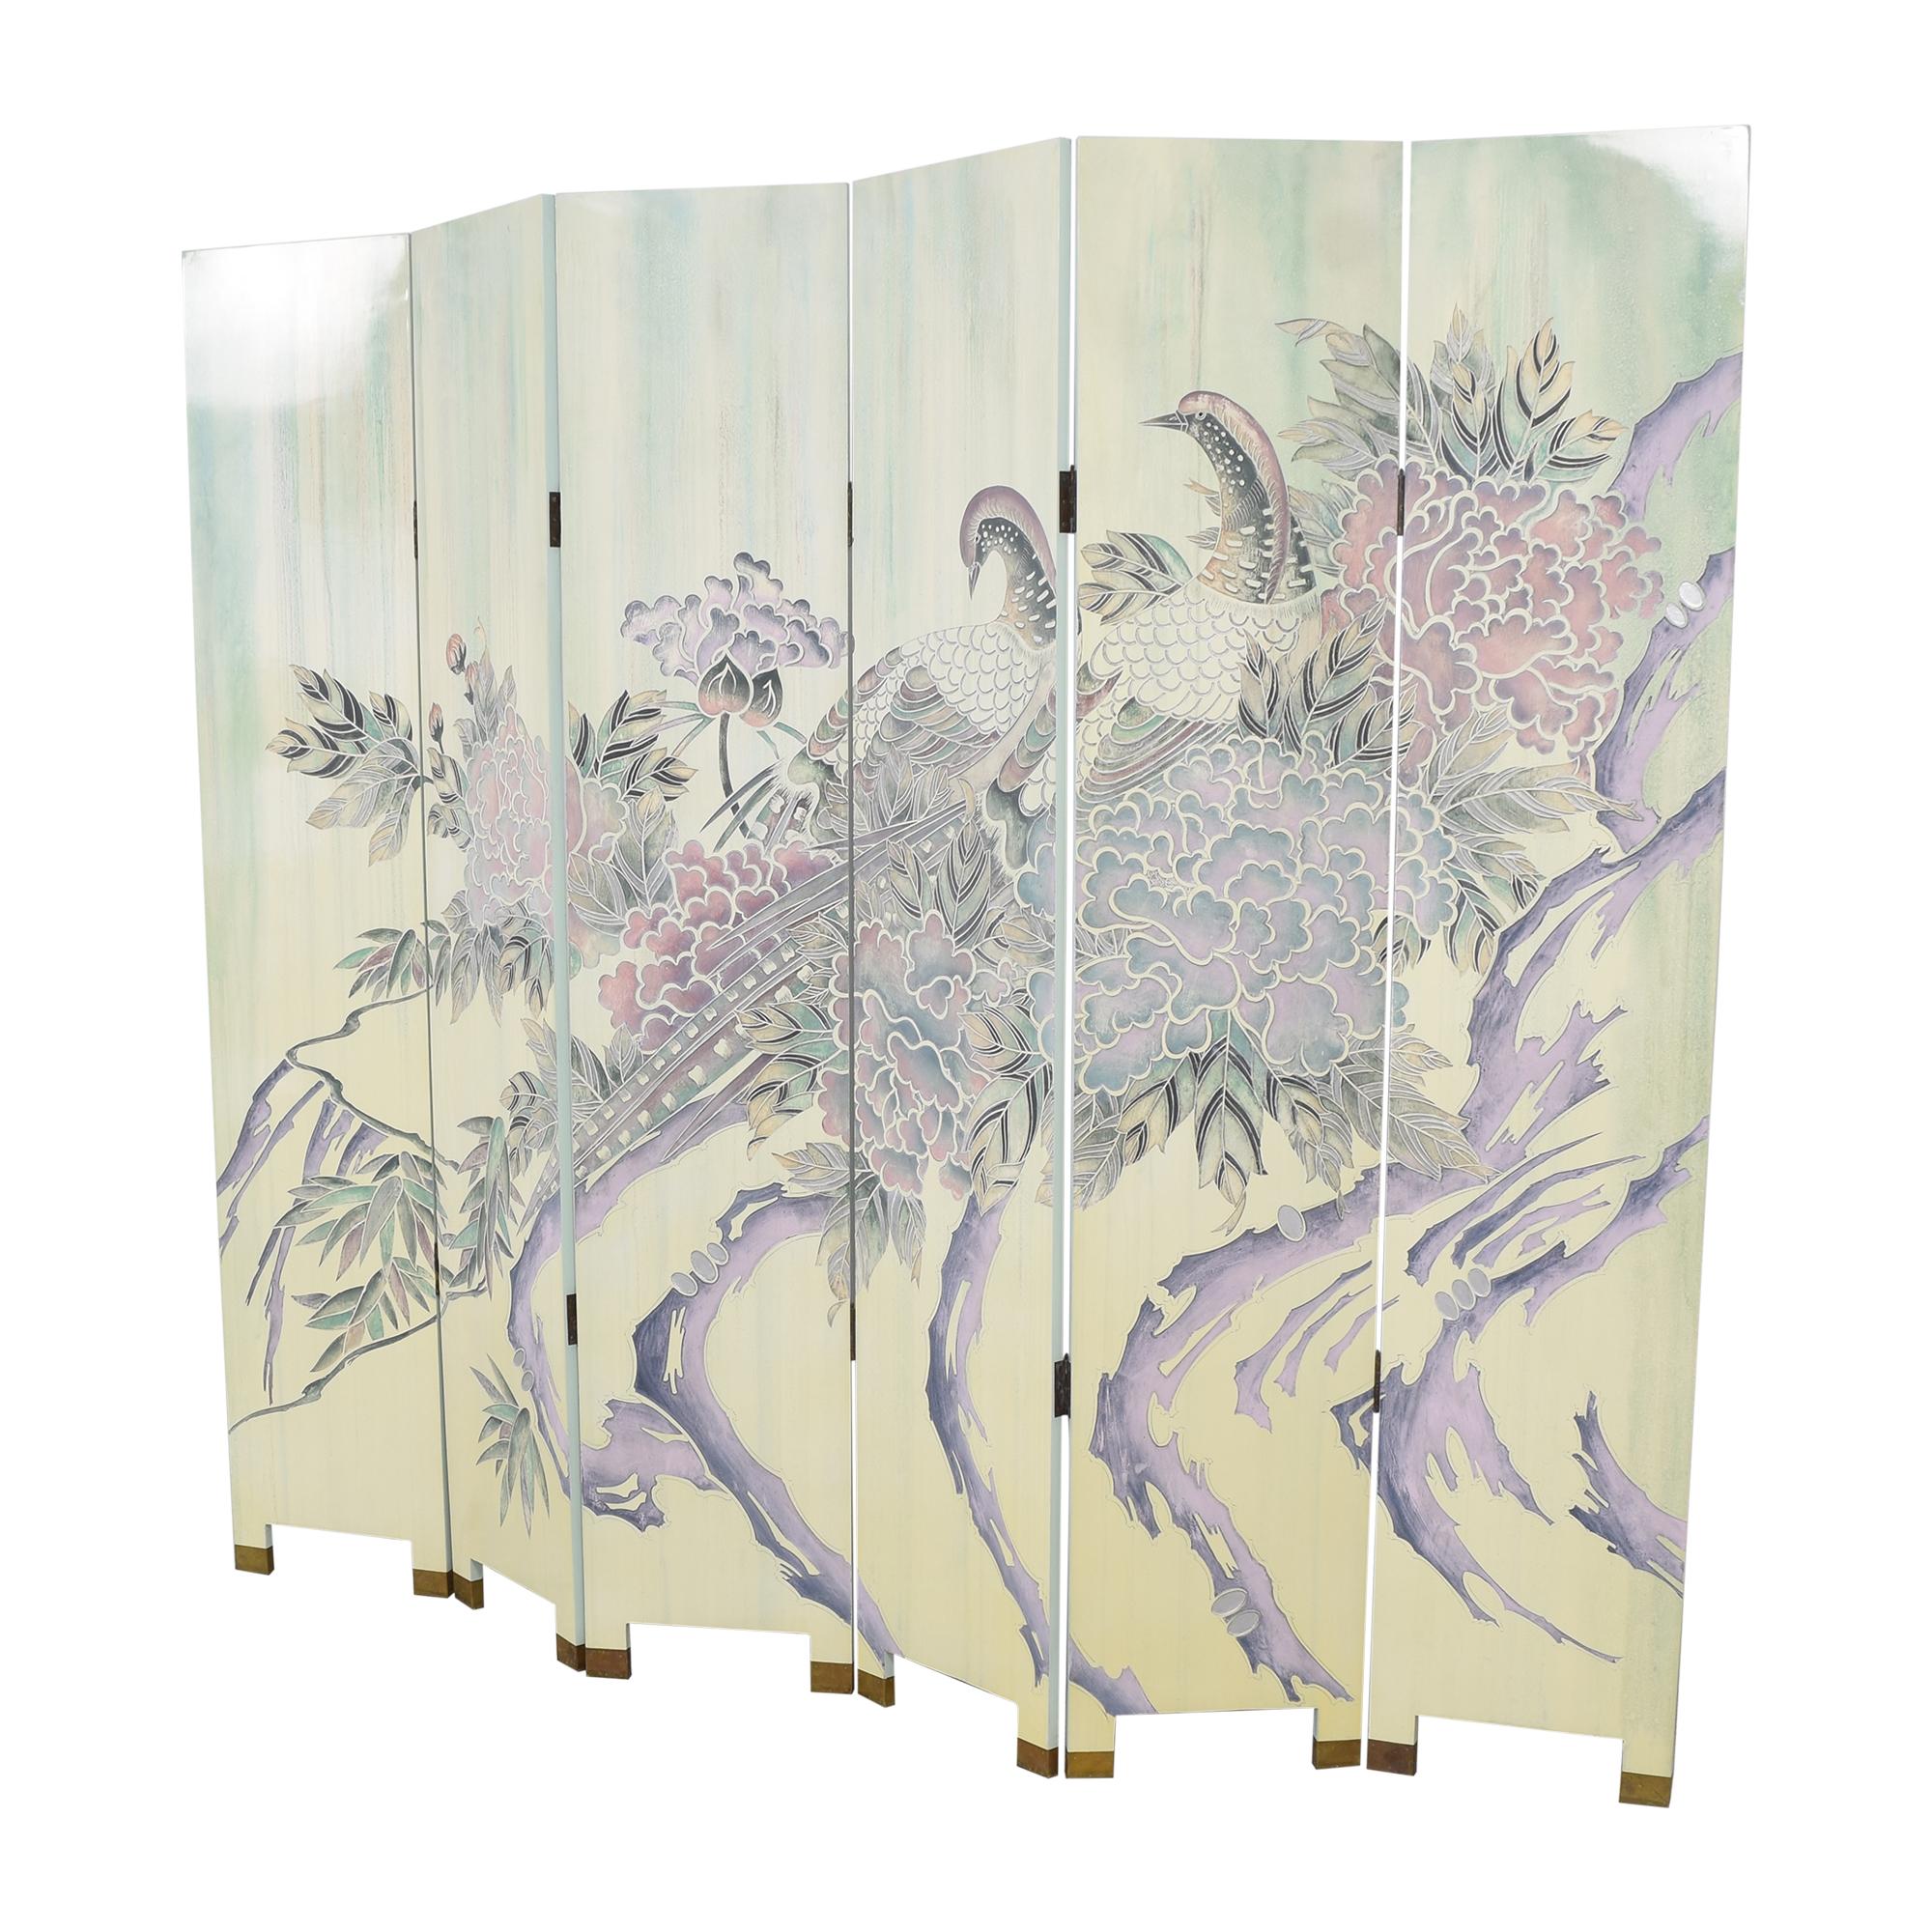 Decorative Six Panel Room Screen / Decor